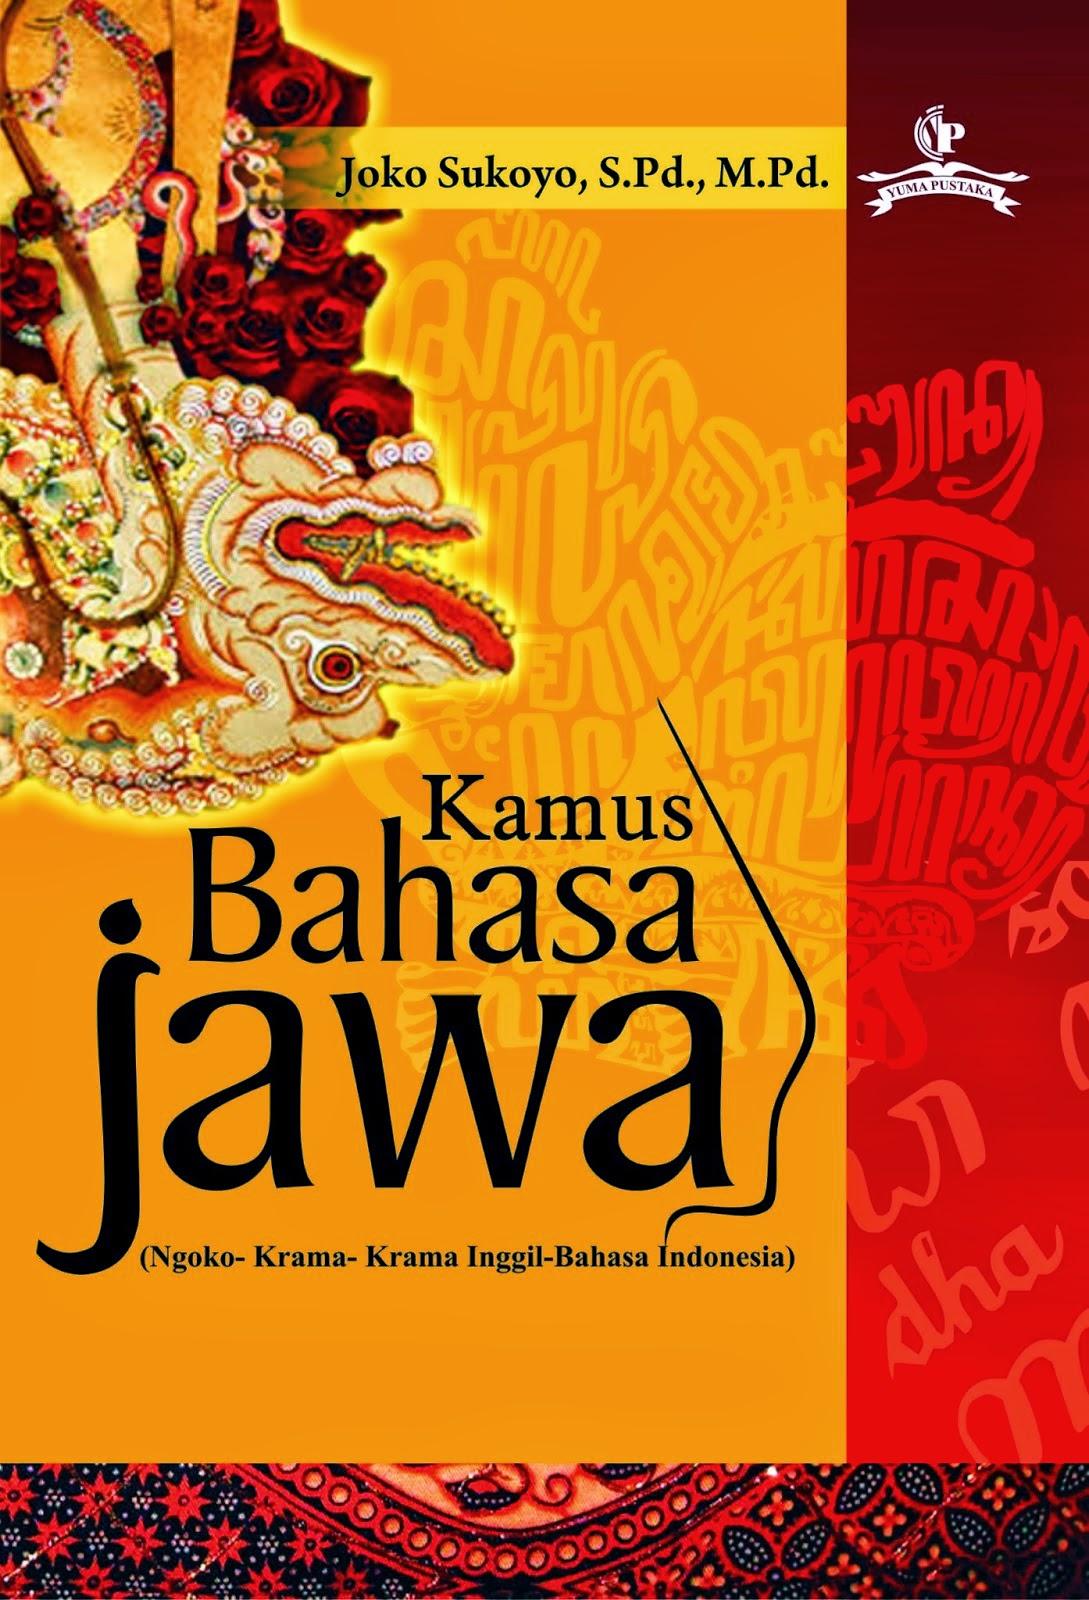 translate+bahasa+jawa Kamus Bahasa Jawa Online